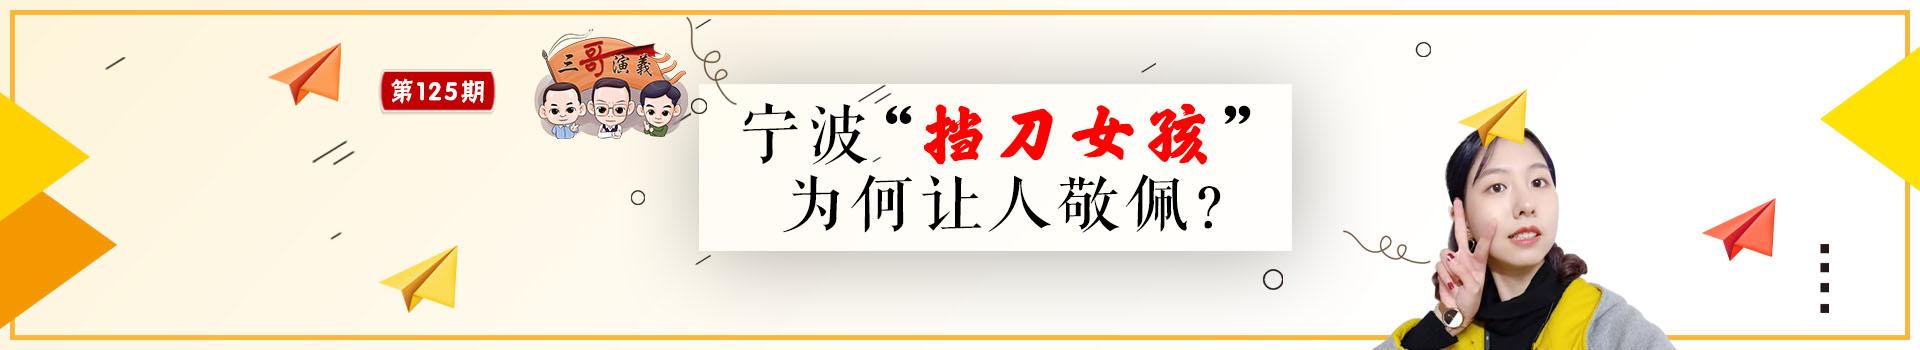 No.120三哥演义